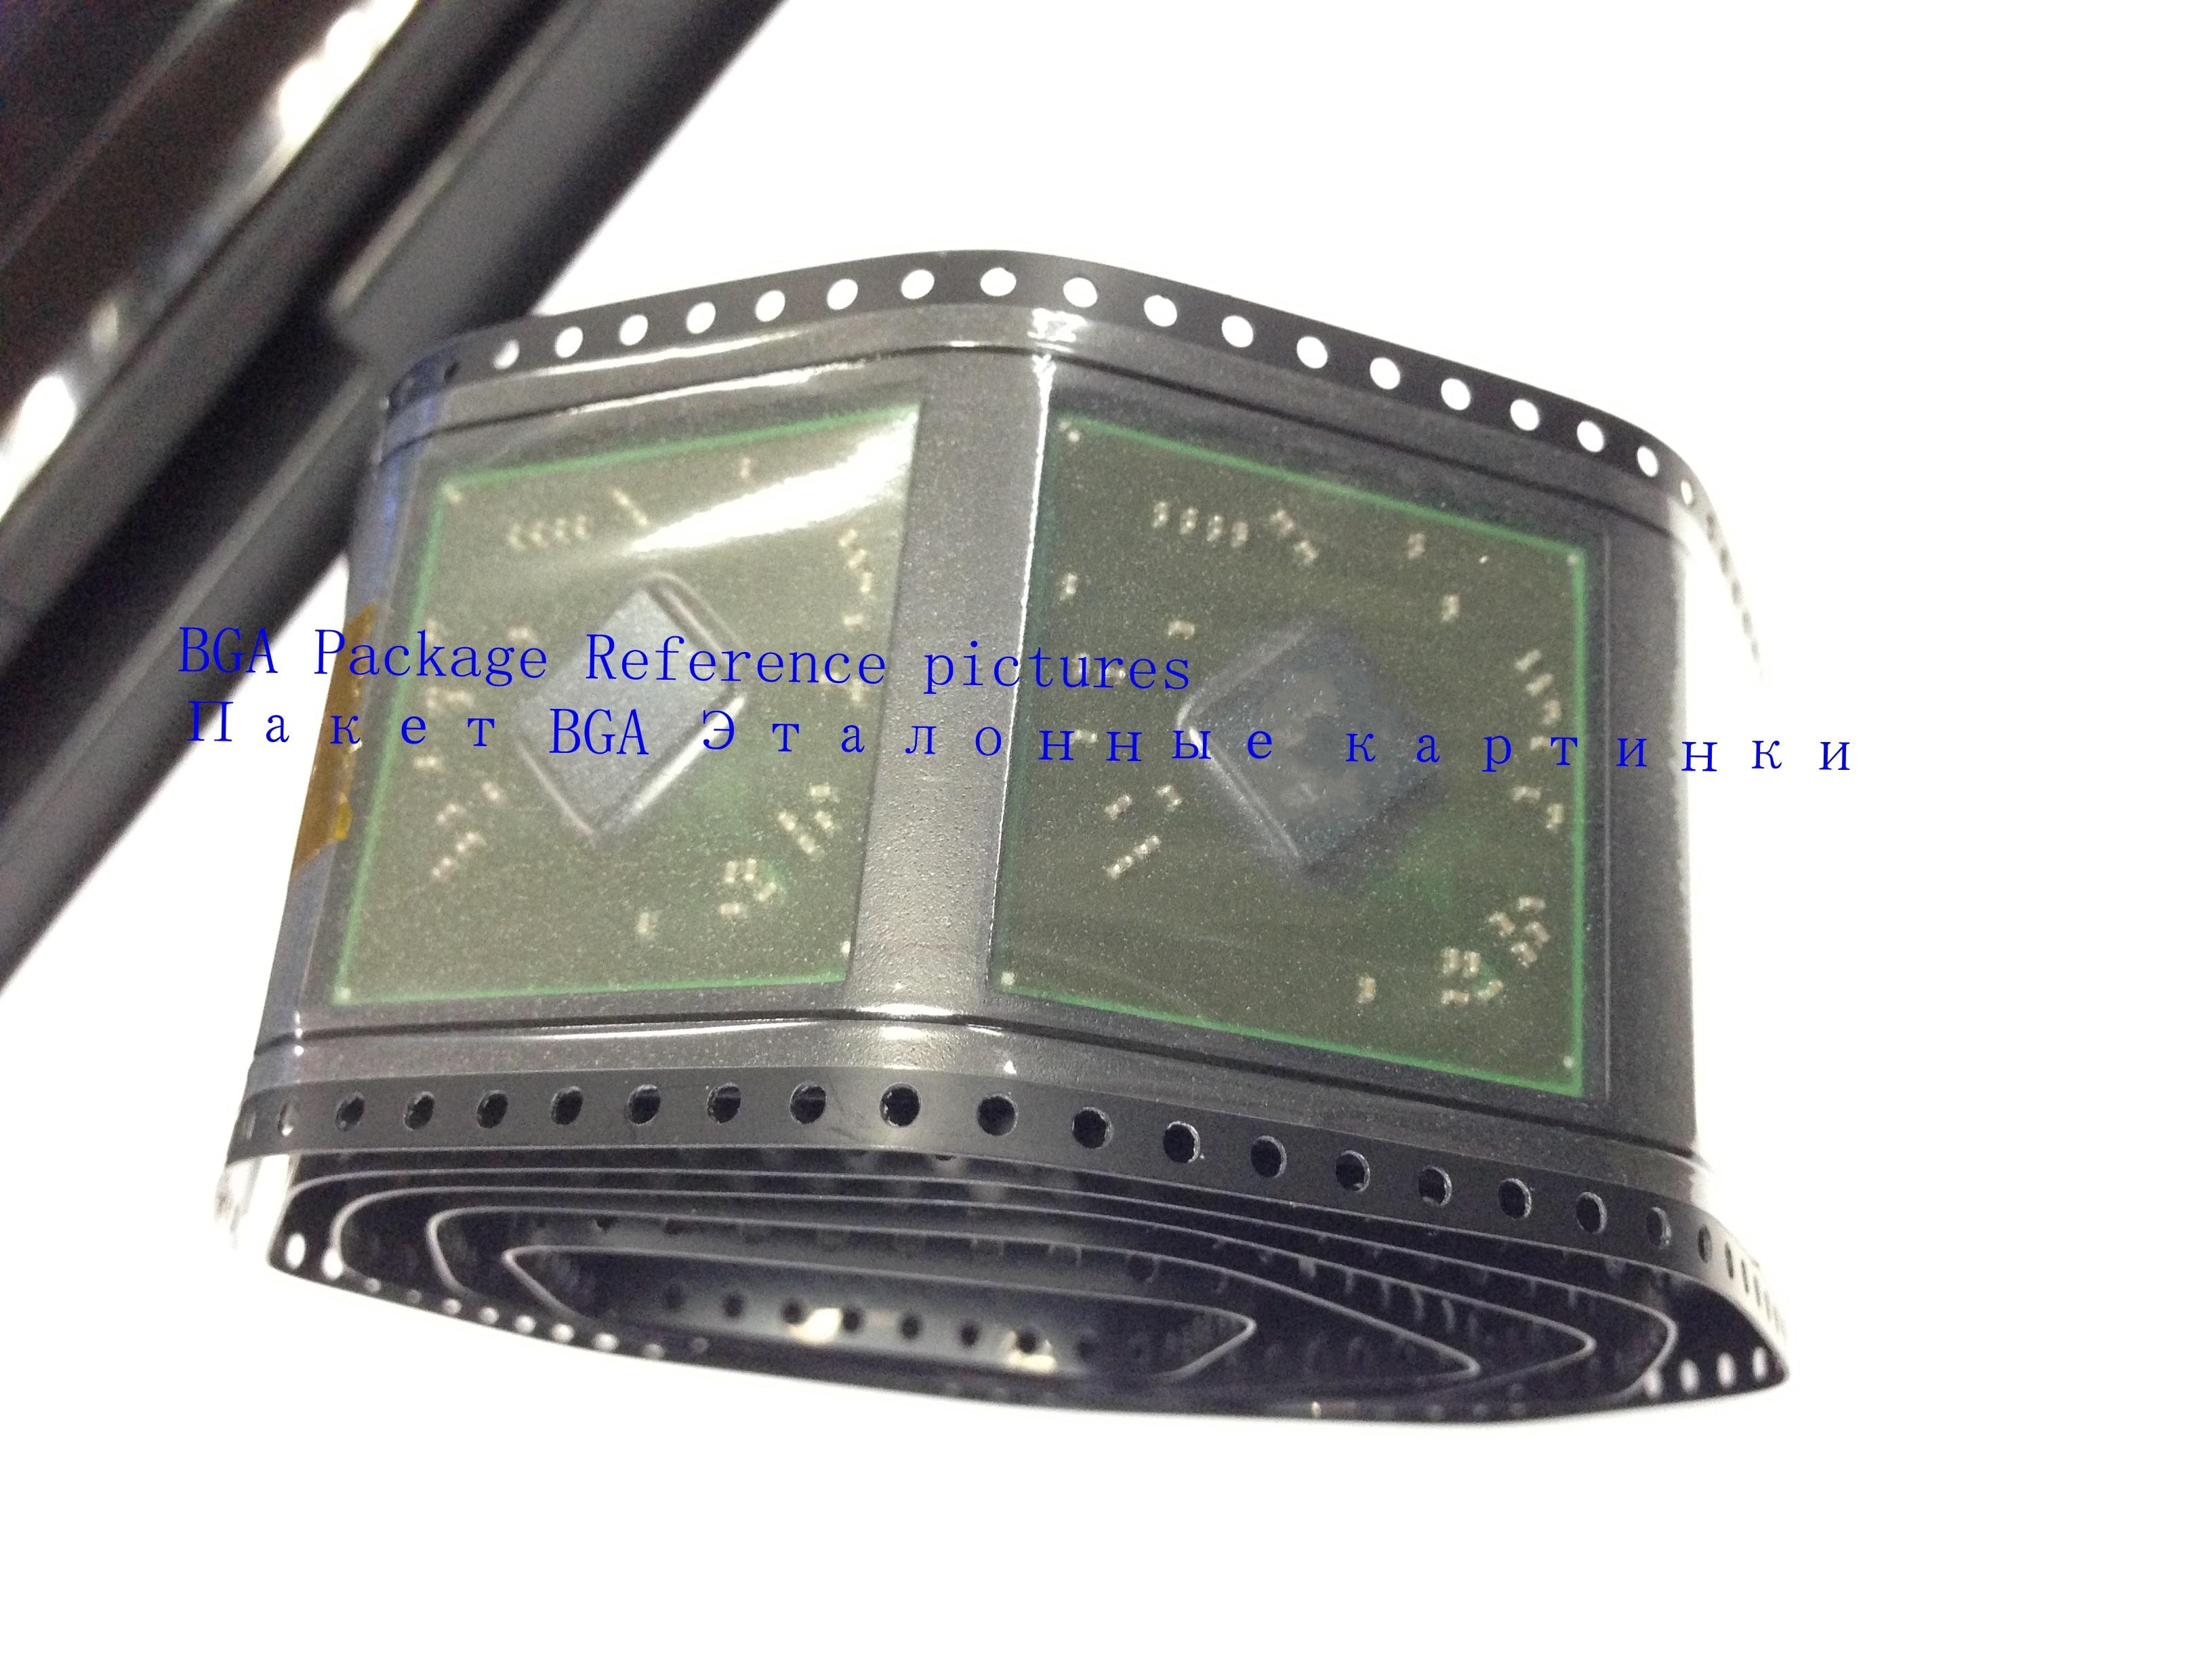 1pcs/lot 100% New MCP79MVL-B2 MCP79MVL B2 BGA Chipset1pcs/lot 100% New MCP79MVL-B2 MCP79MVL B2 BGA Chipset